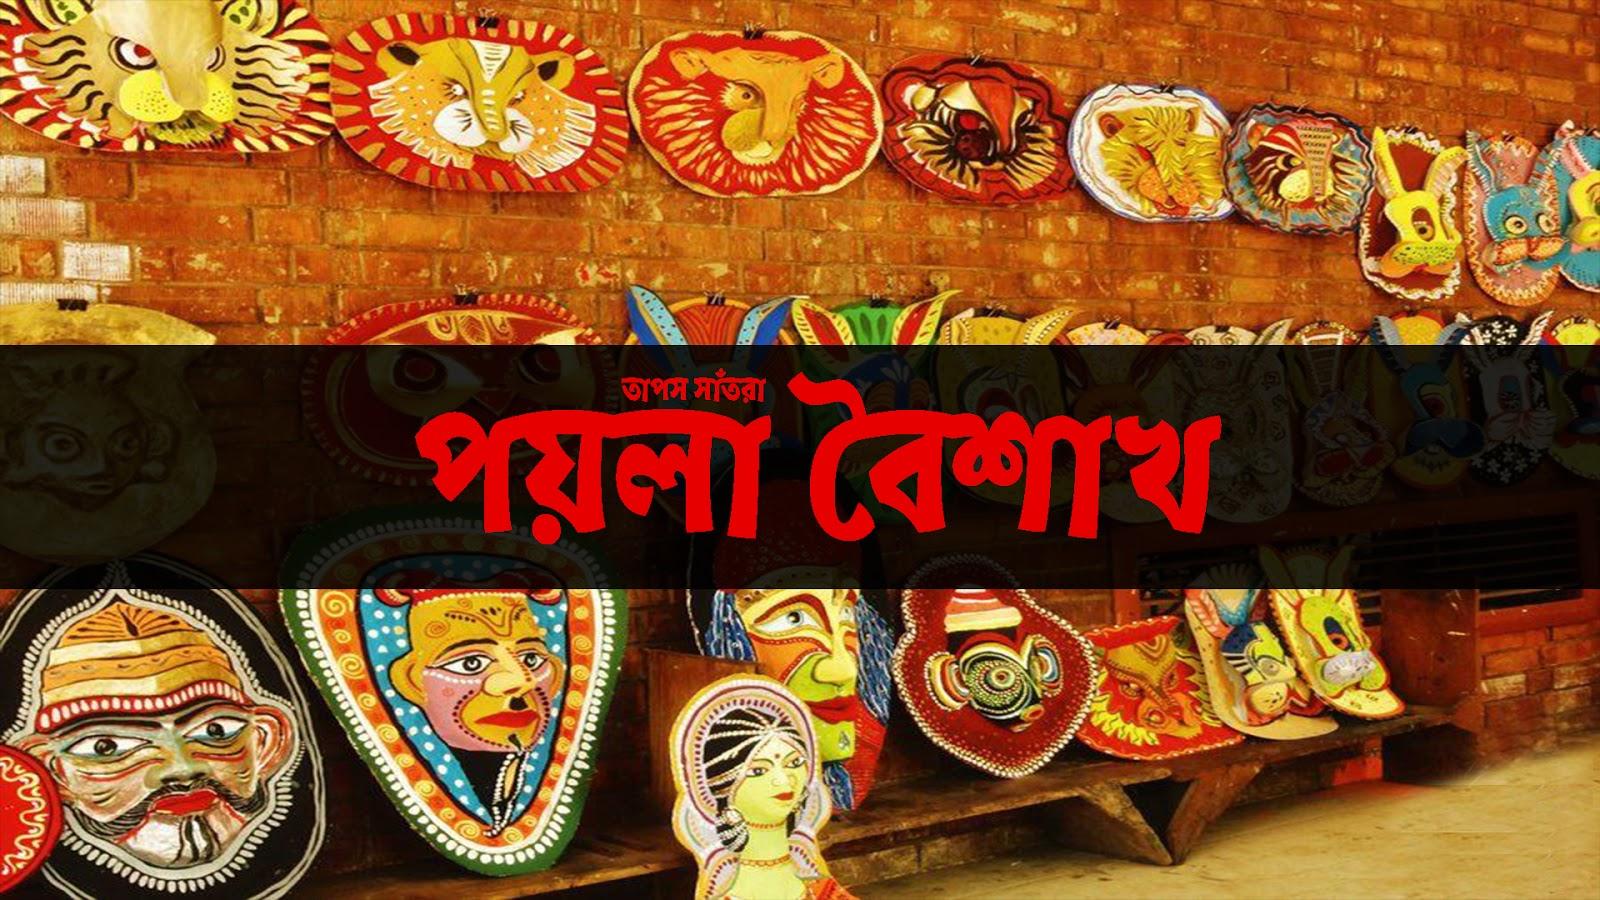 Bengla Golpo : পয়লা বৈশাখ রচনা তাপস সাঁতরা || Bengali Story : Poyla Boishakh By Tapash Satra || DjM Originals